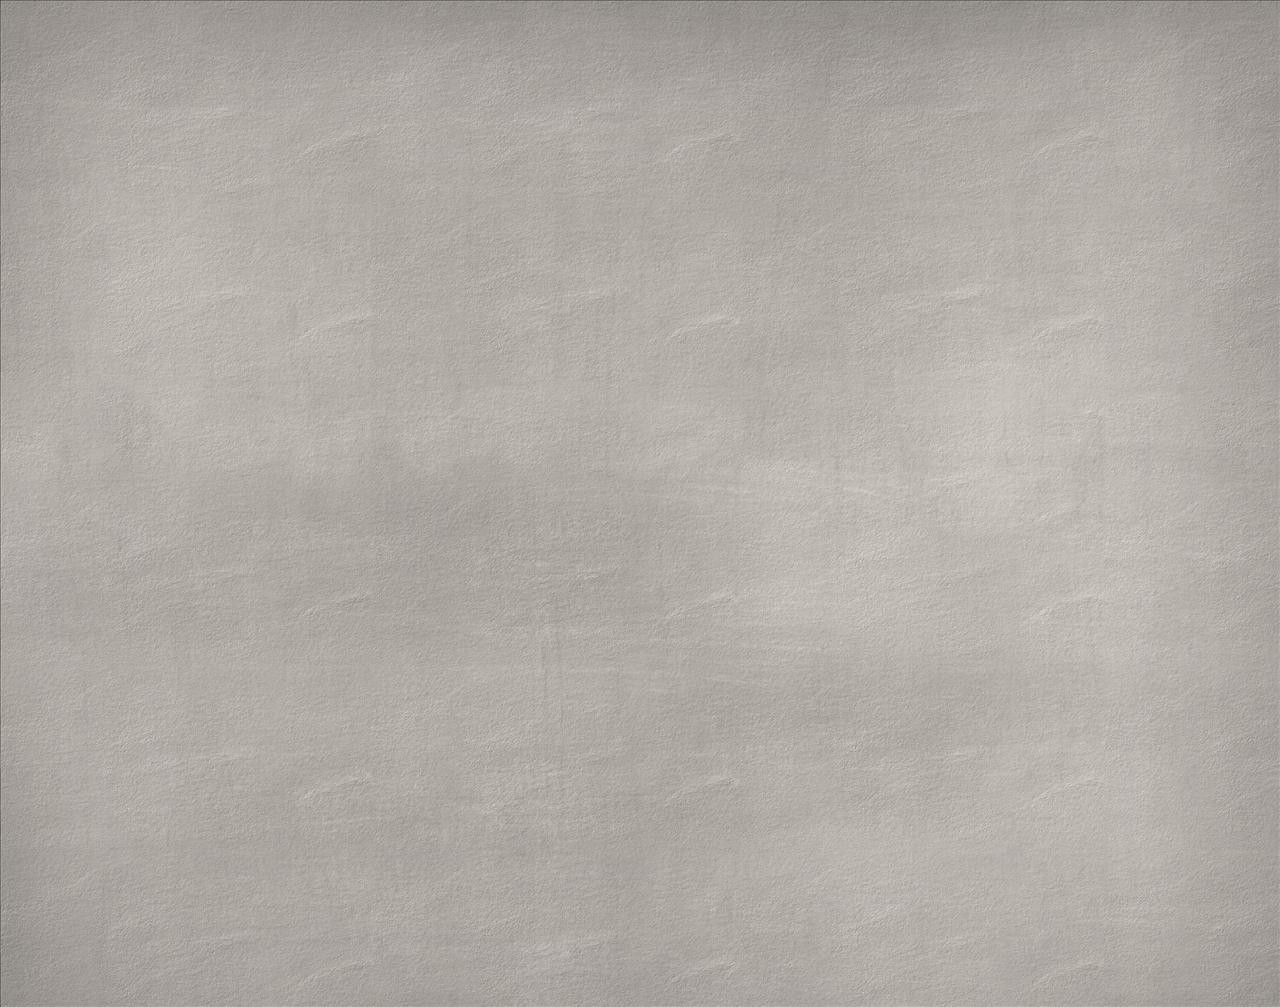 Gray Parchment Backgrounds